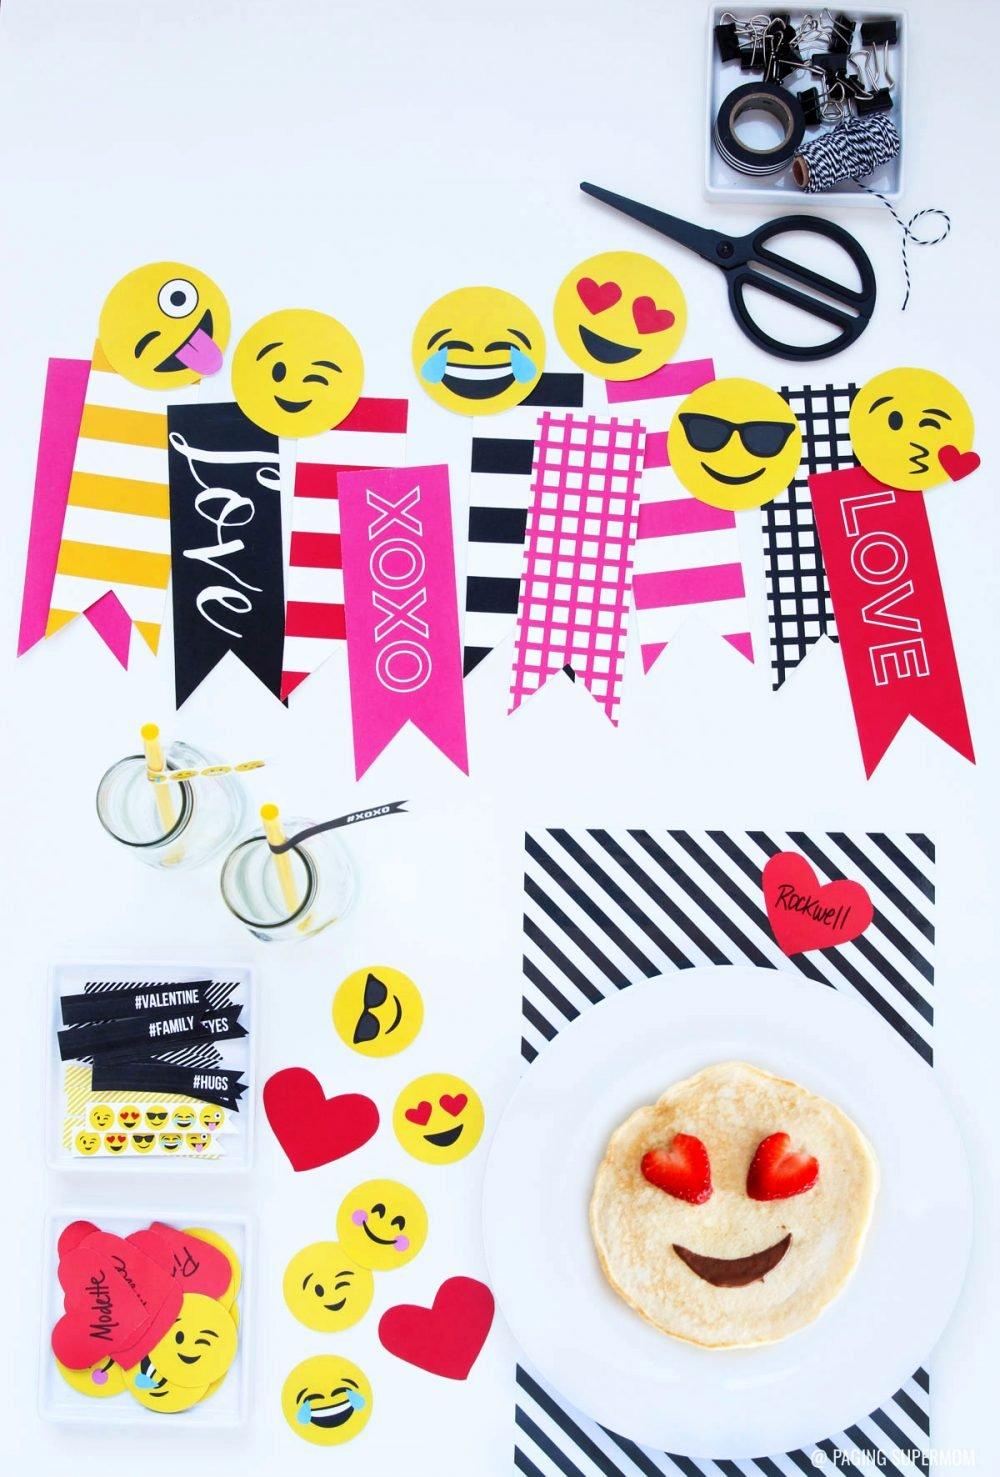 Emoji Valentines Breakfast Ideas - 25-page printable kit featuring all your favorite Emojis via @PagingSupermom